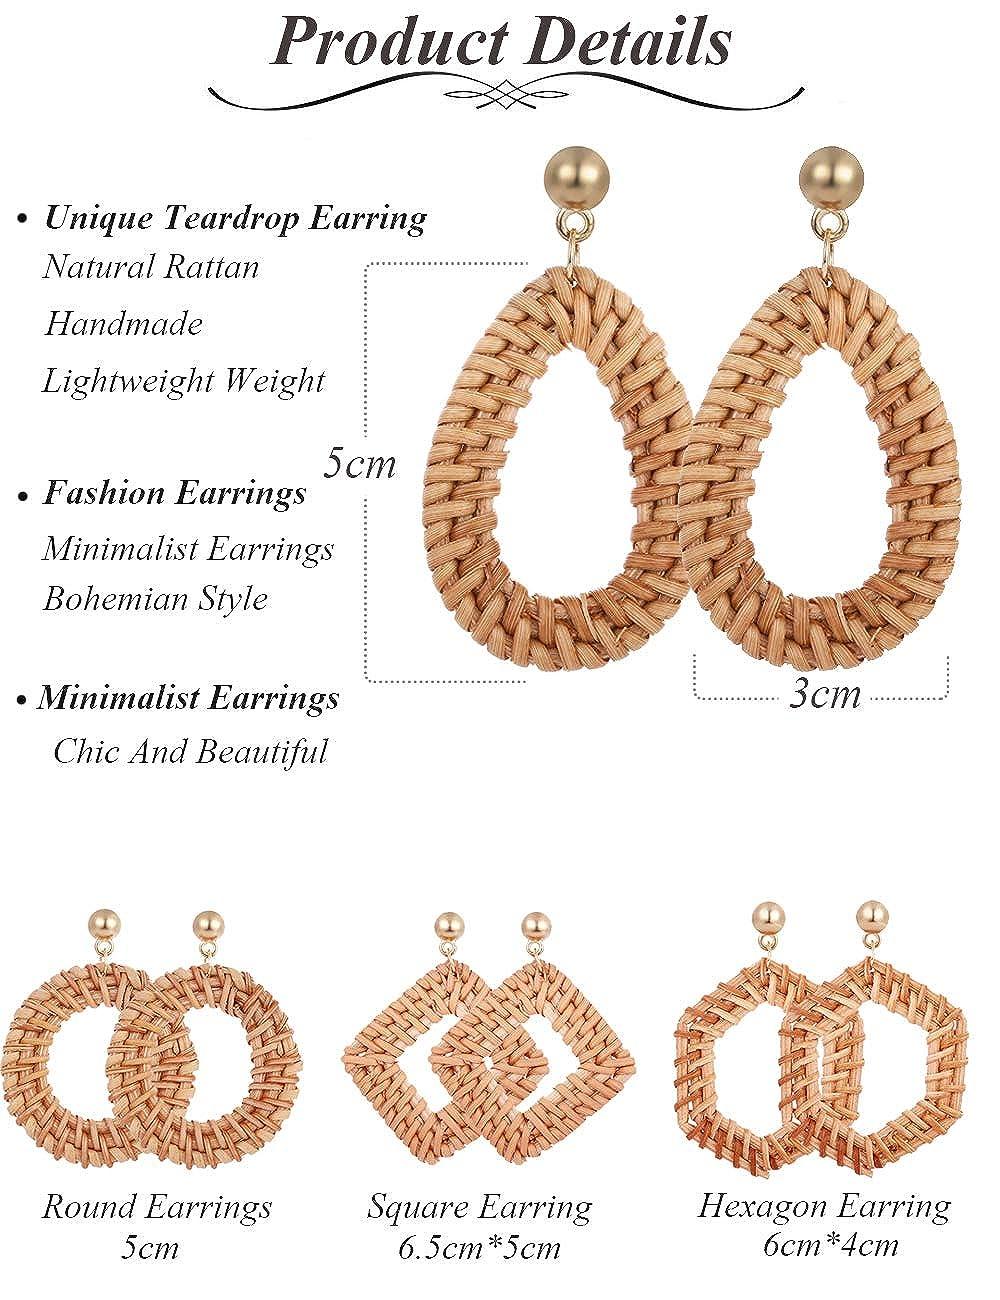 VALIJINA 2 Pairs Rattan Dangle Drop Earrings for Women Girls Bohemia Handmade Straw Woven Lightweight Geometric Statement Earrings Set